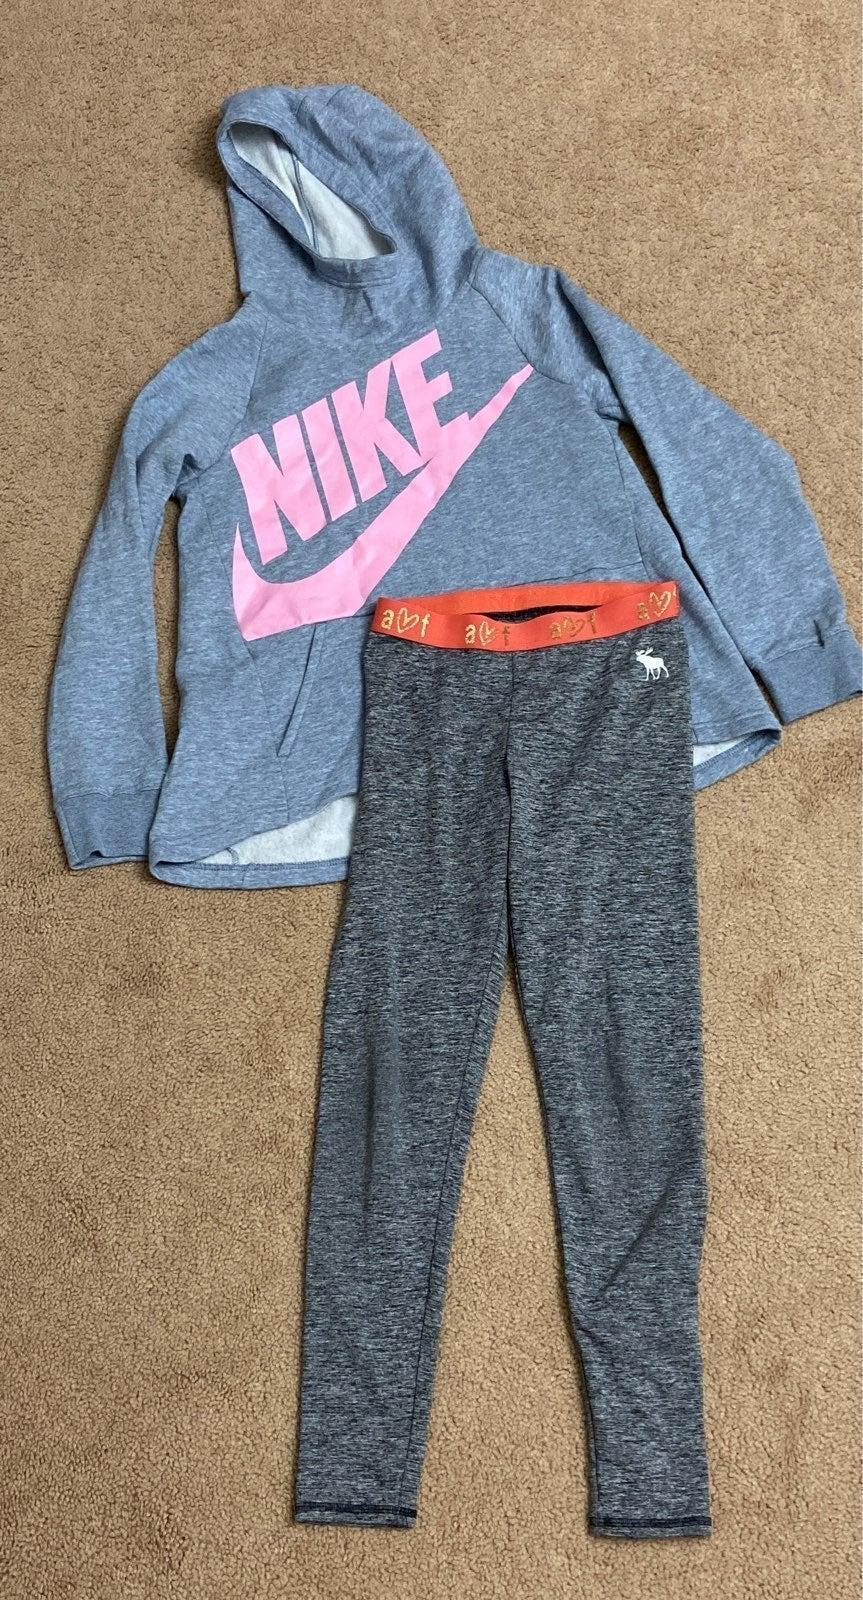 Nike & Abercrombie kids shirt 11/12